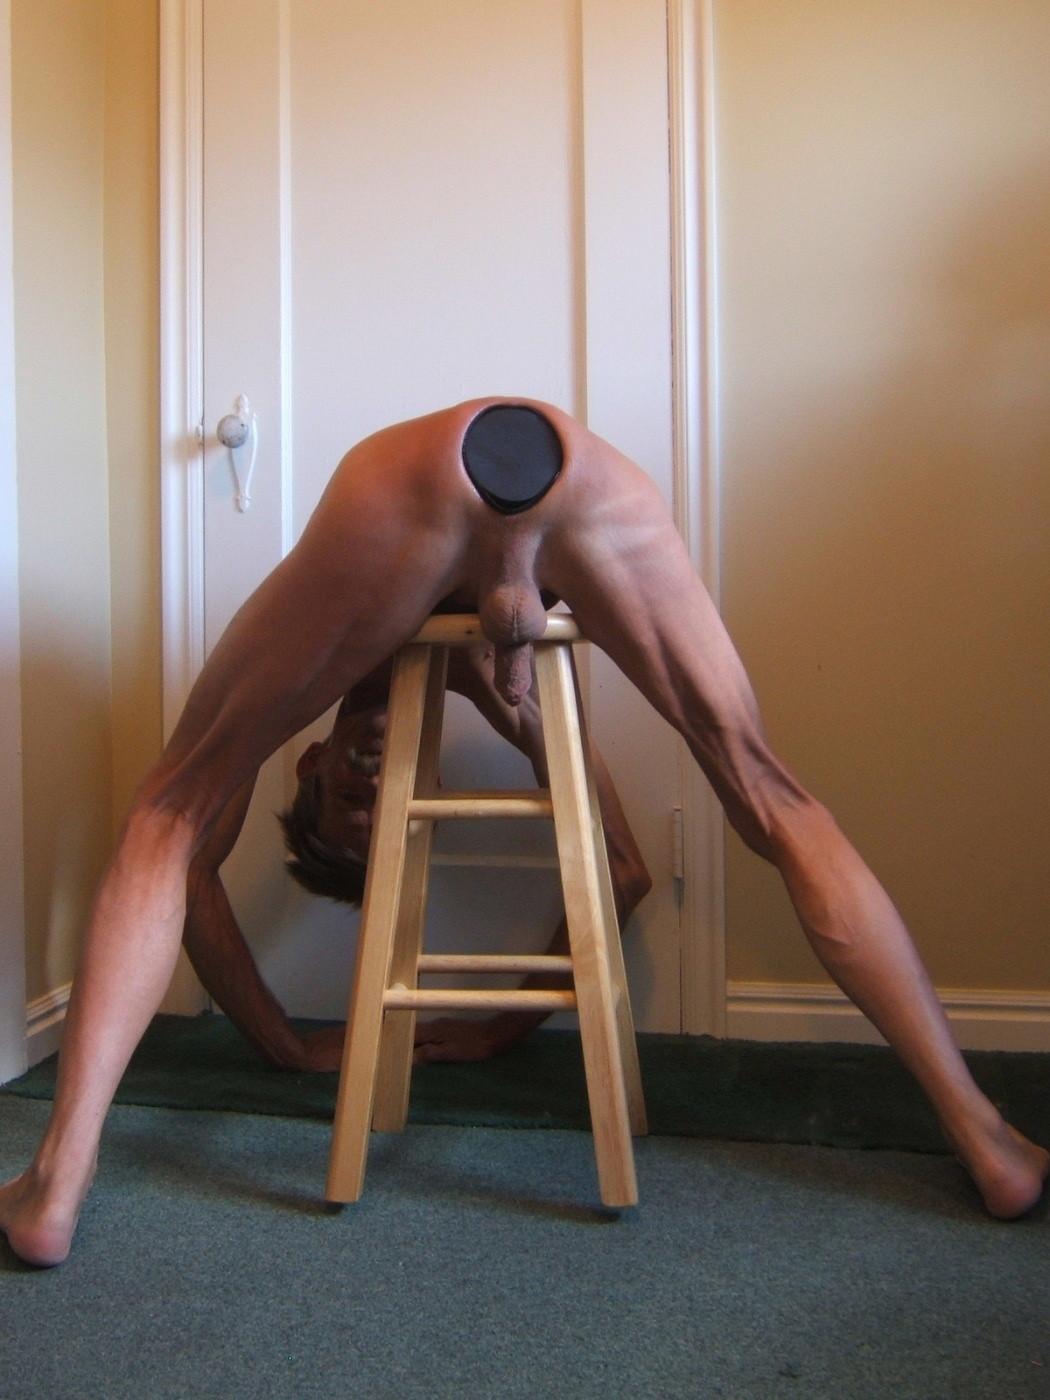 Anal Stretching Tumblr tumblr butt plug gay - megapornx